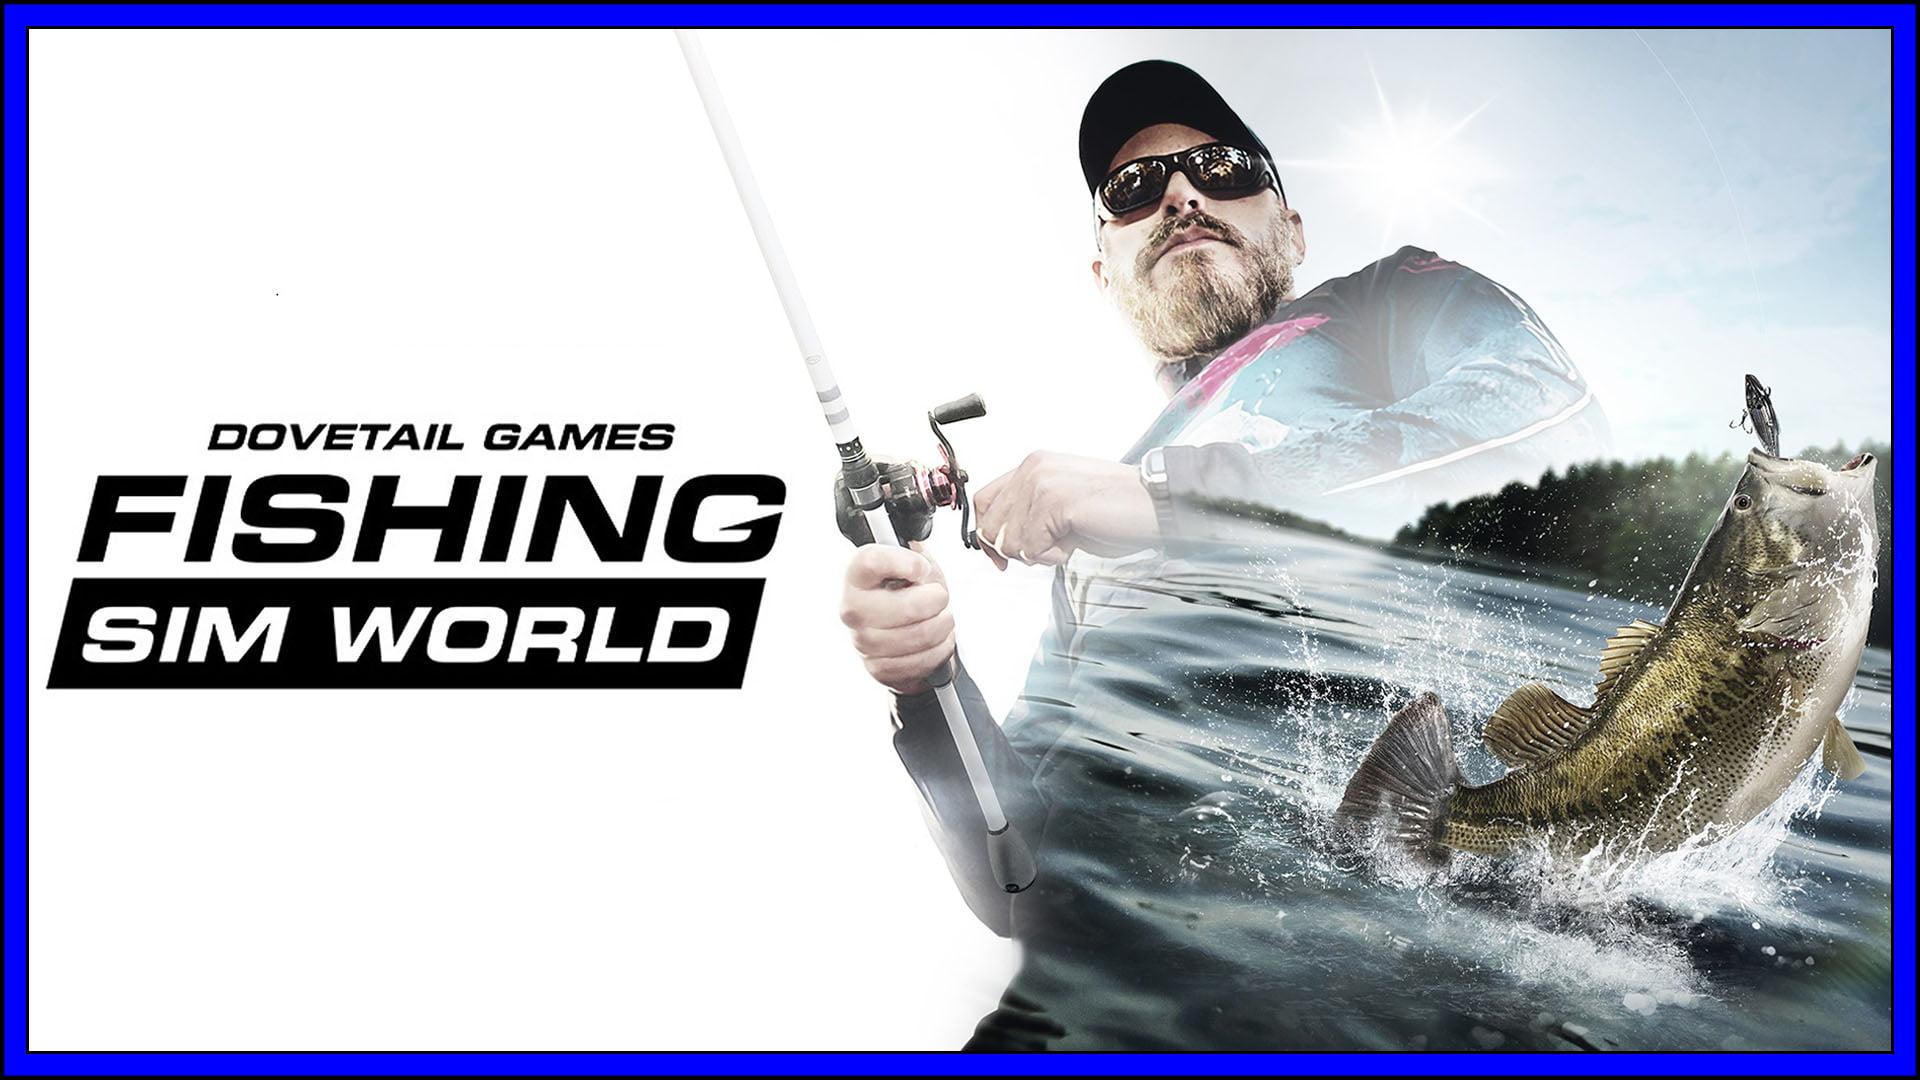 Fishing Sim World Fi3